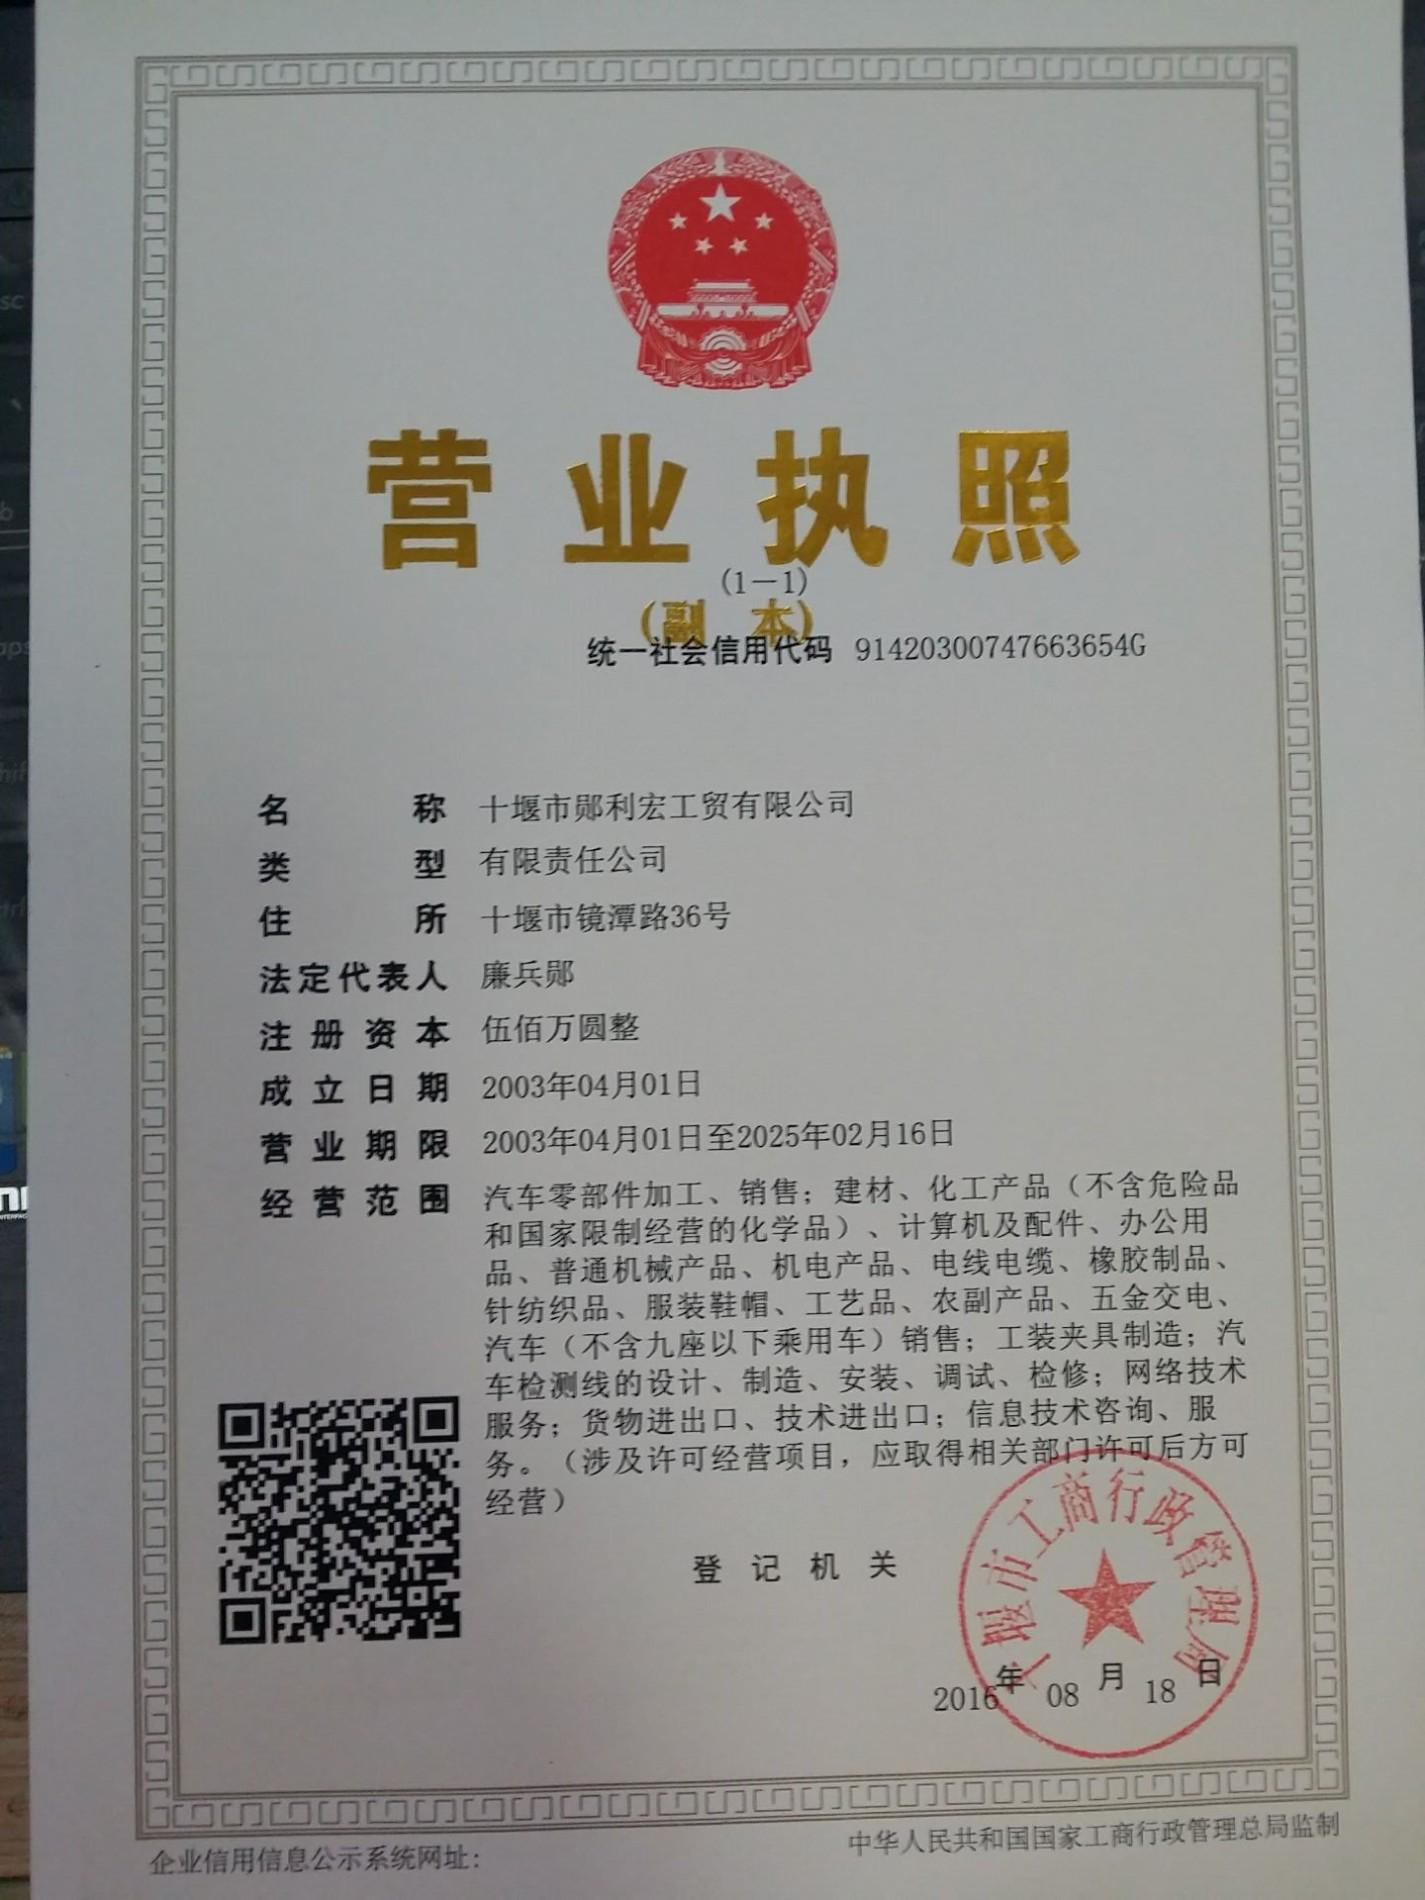 Register license